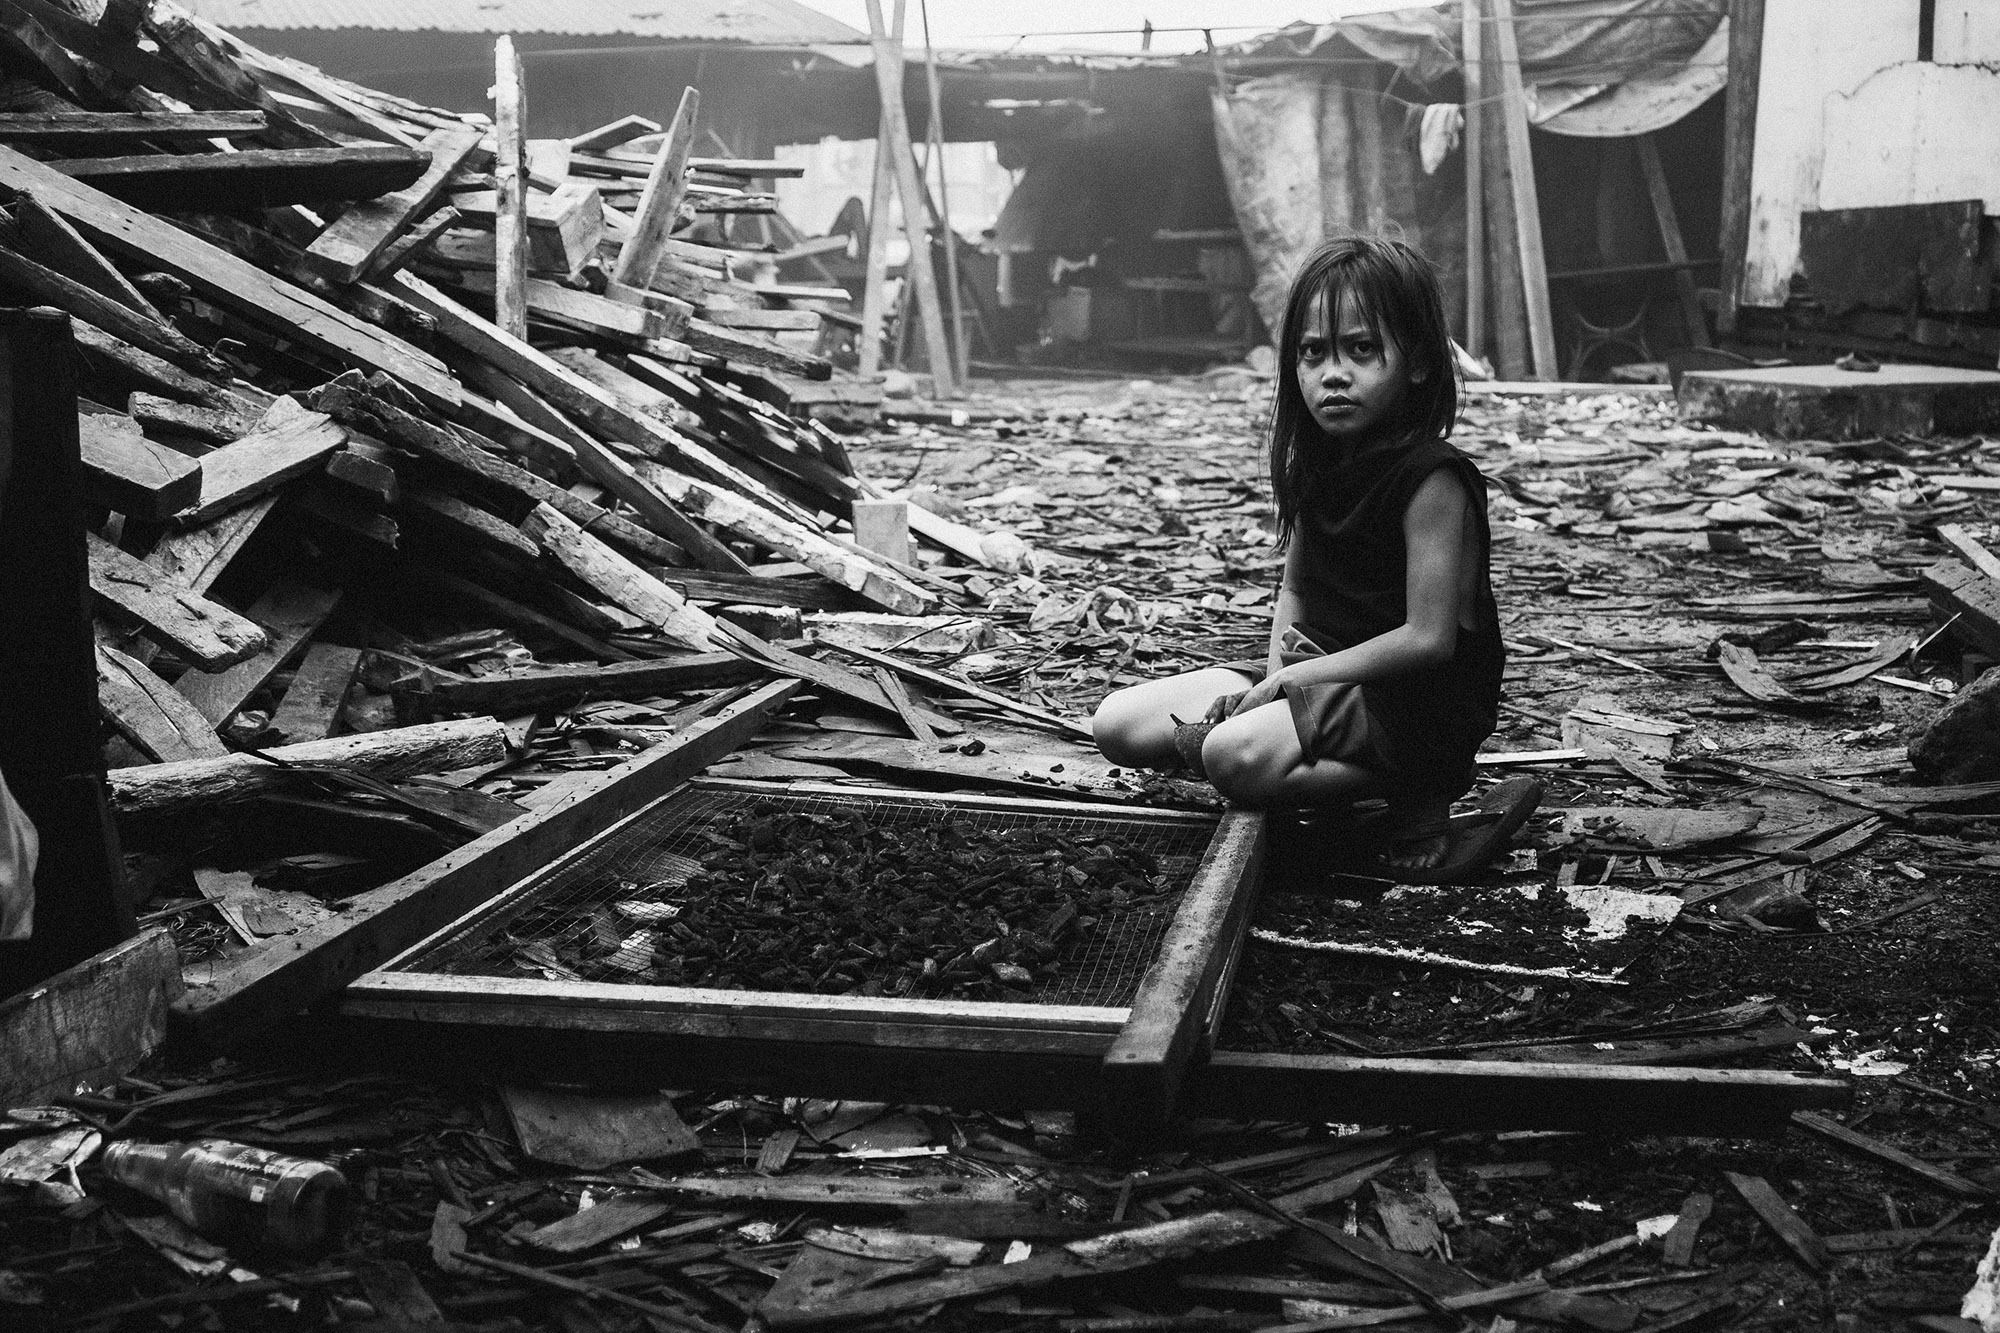 GOSEE SHOP: A world in distress